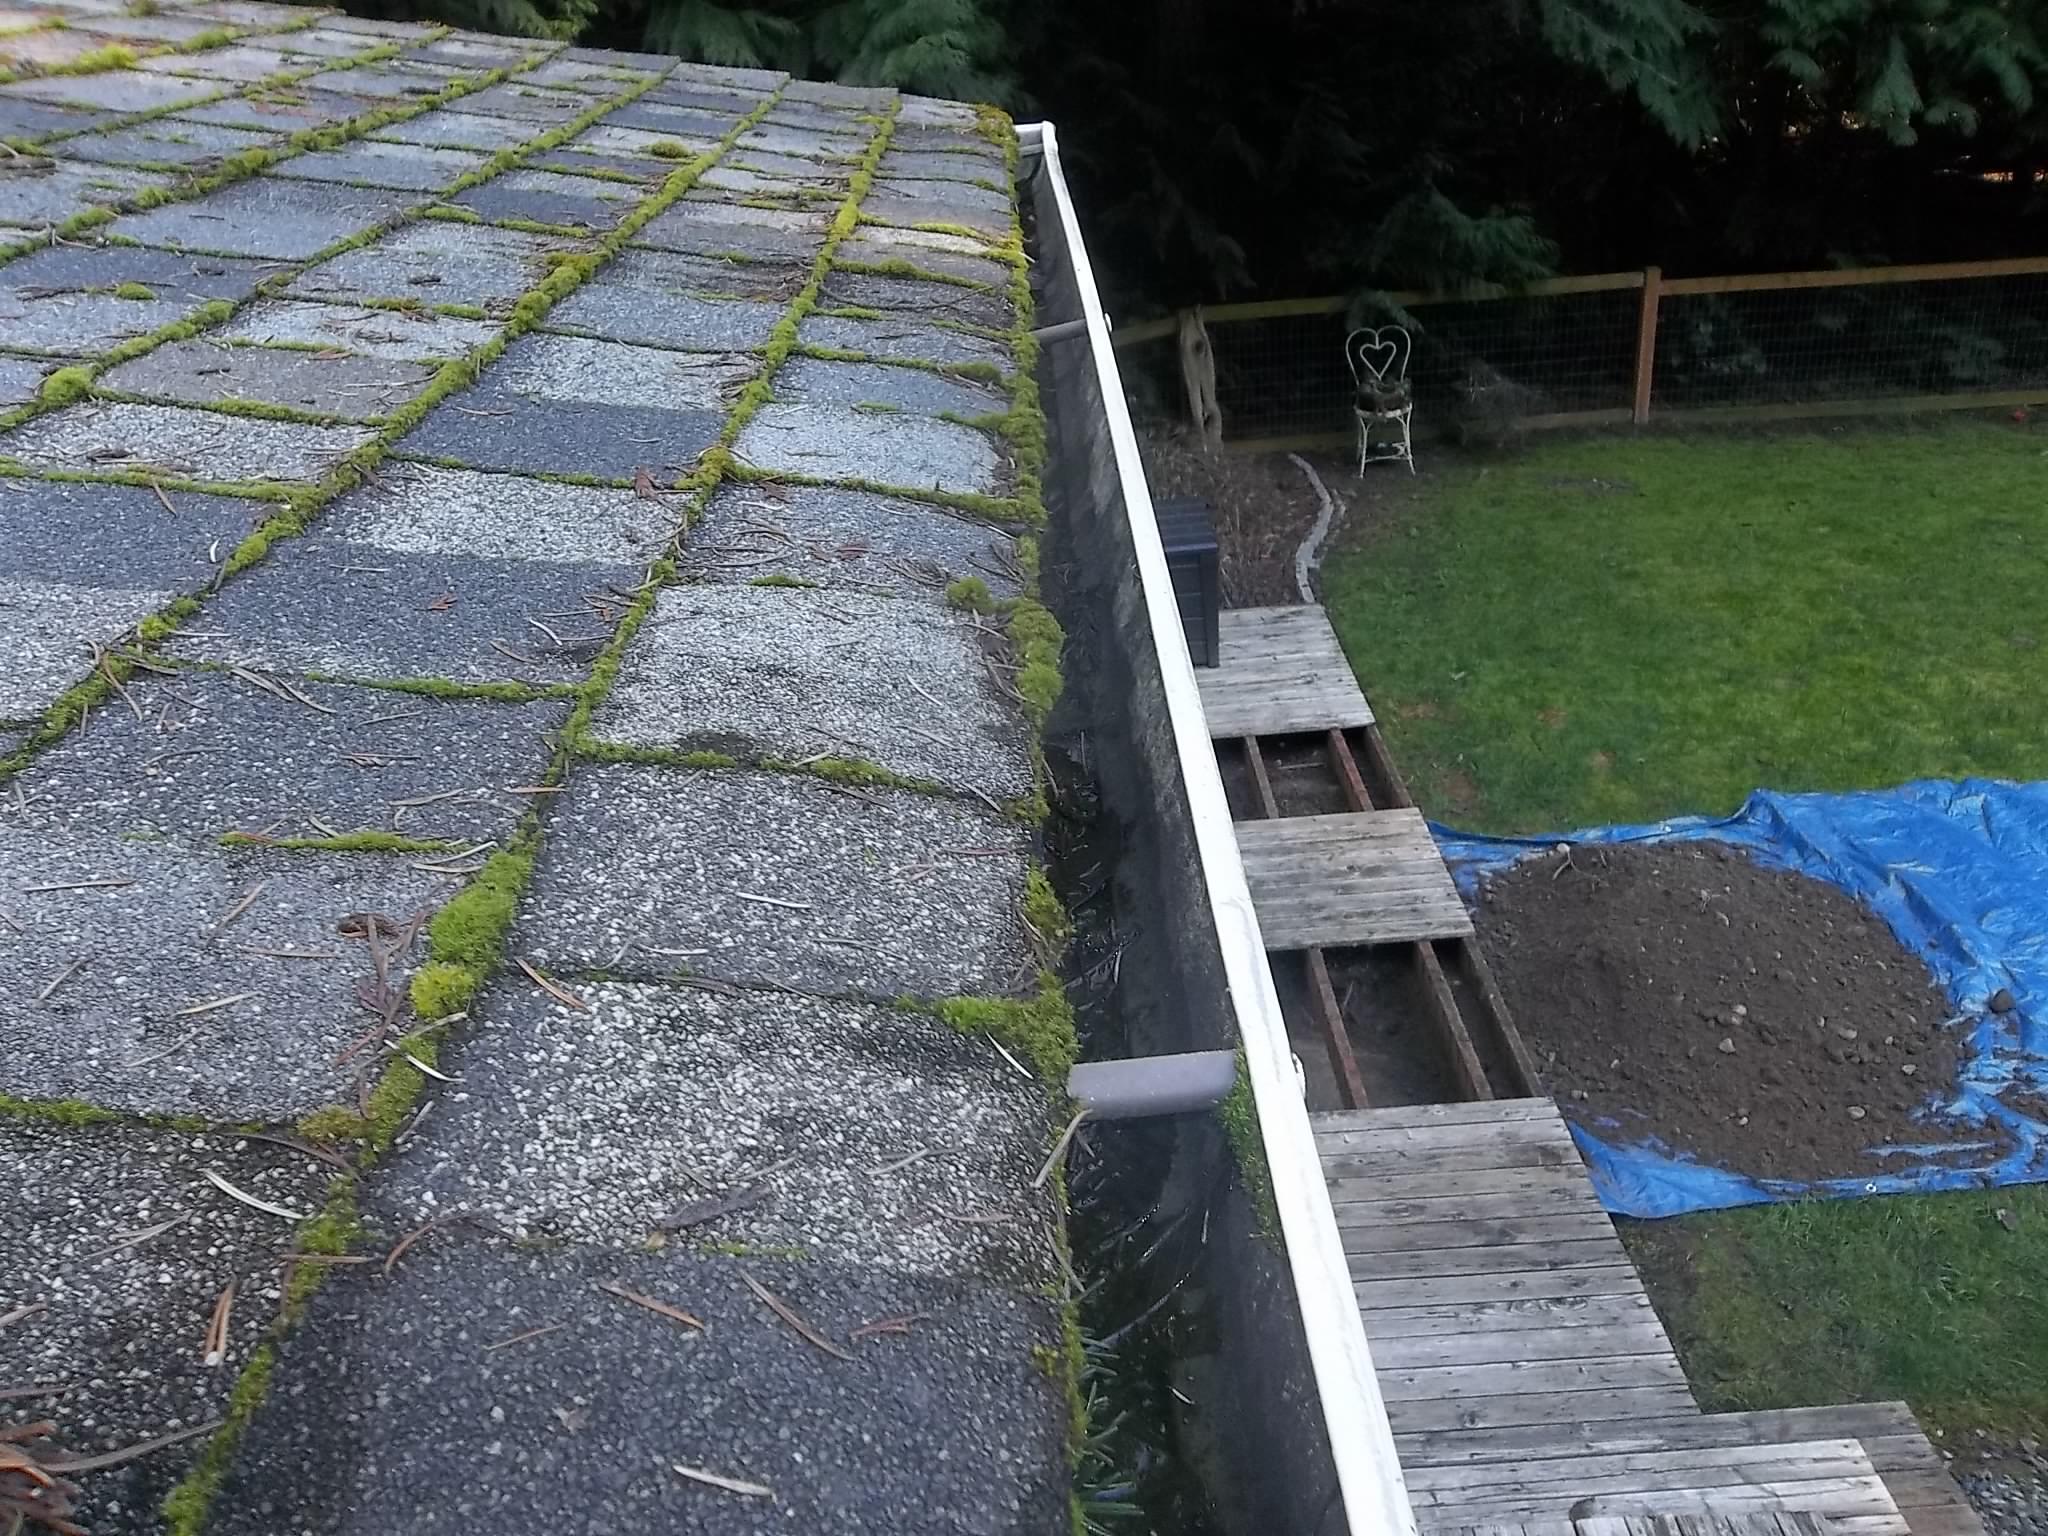 Roof gutters